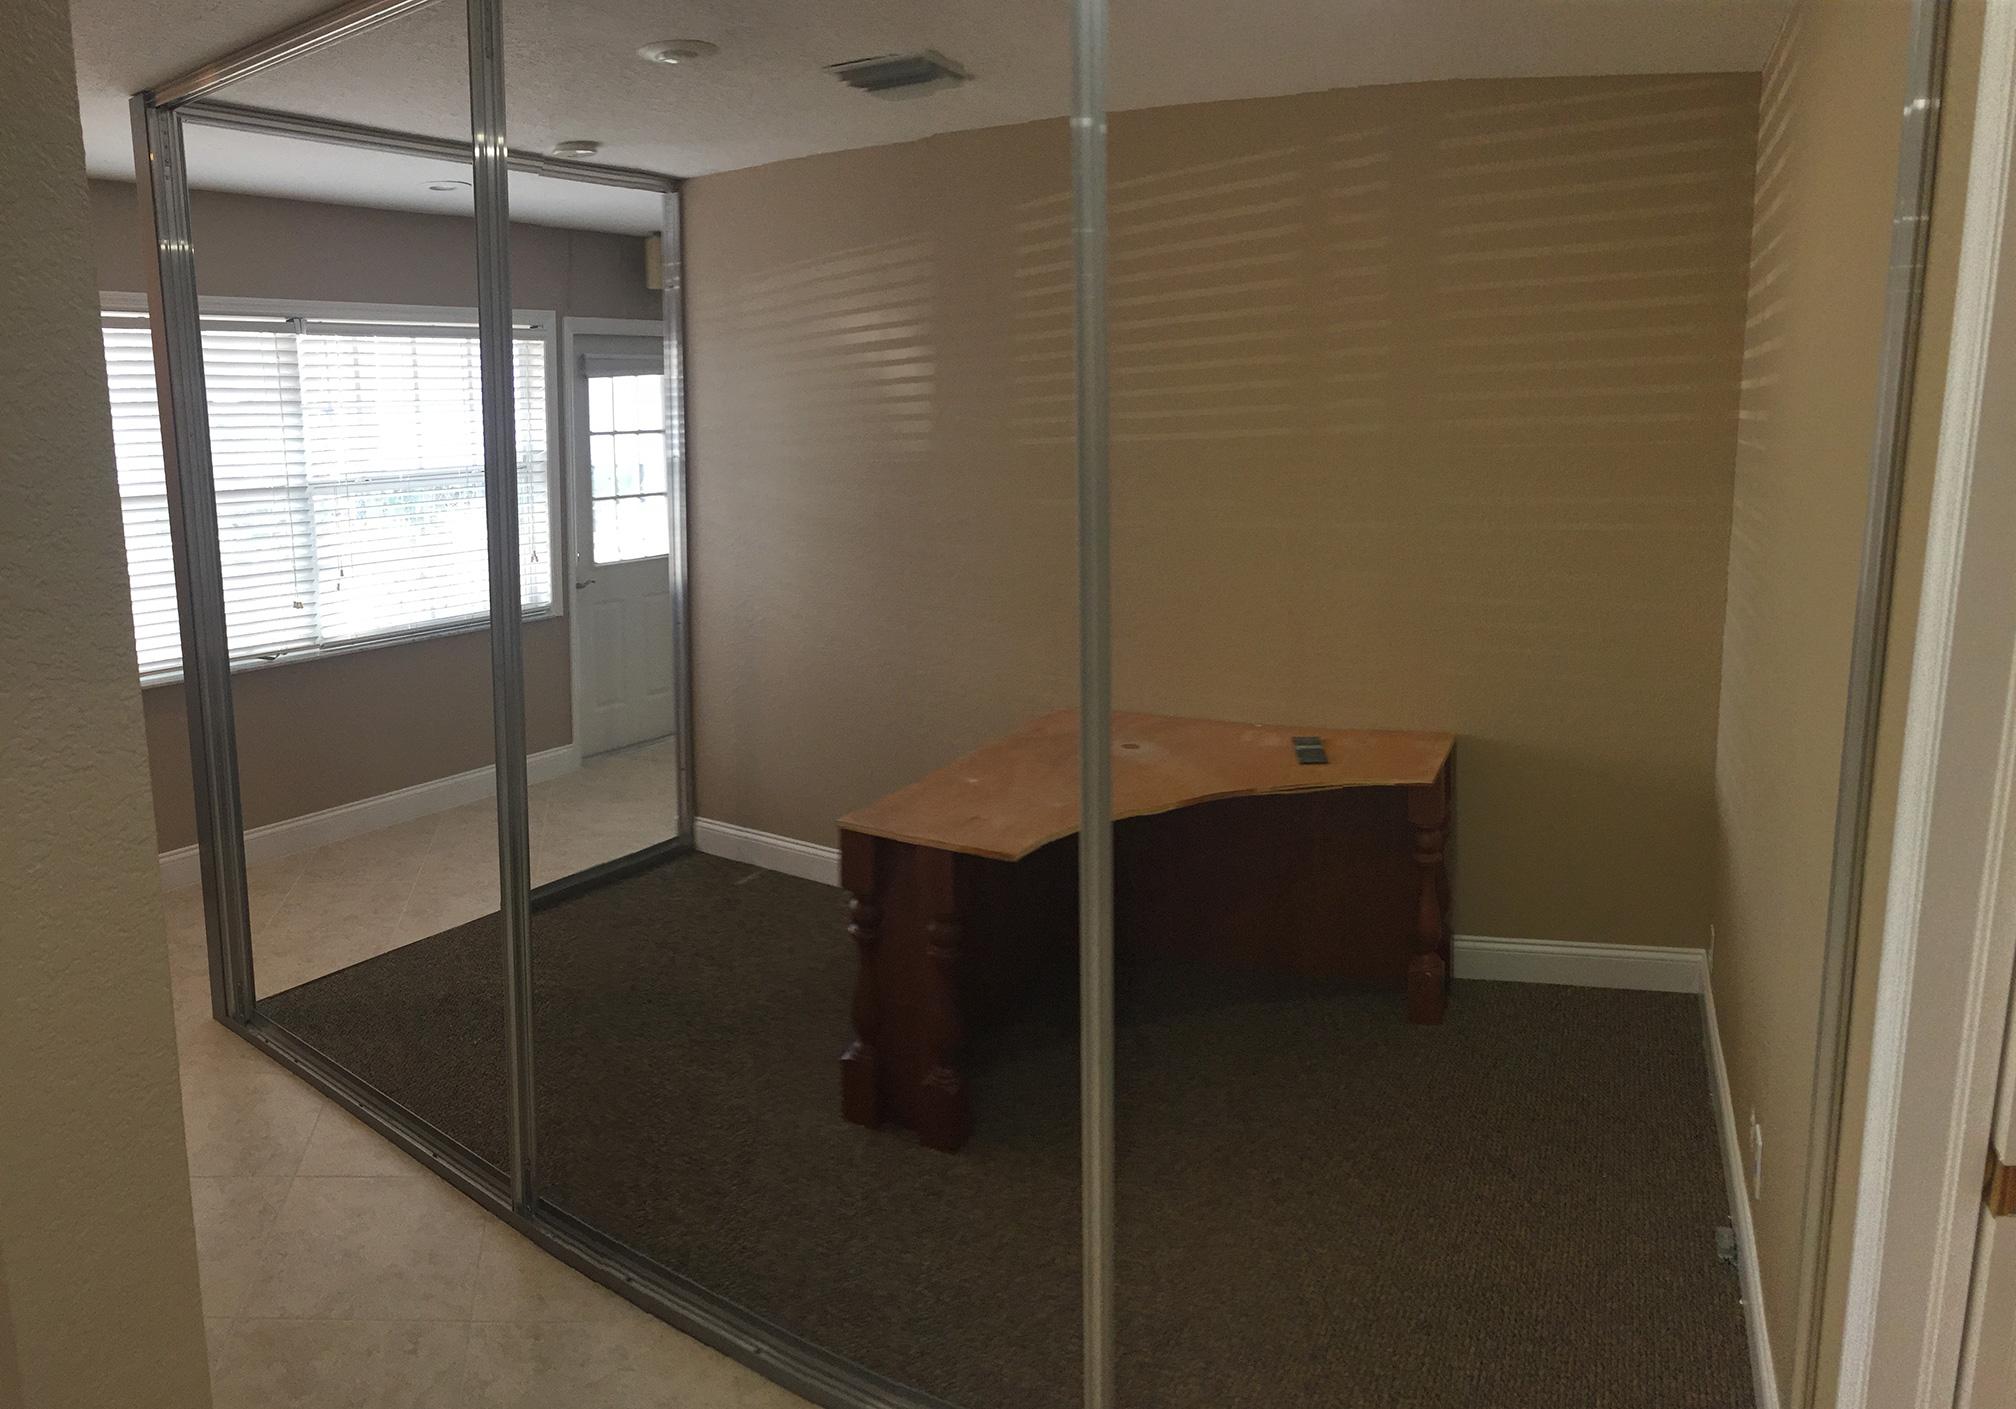 manasota-office-supplies-llc-img-6015-16-.jpg